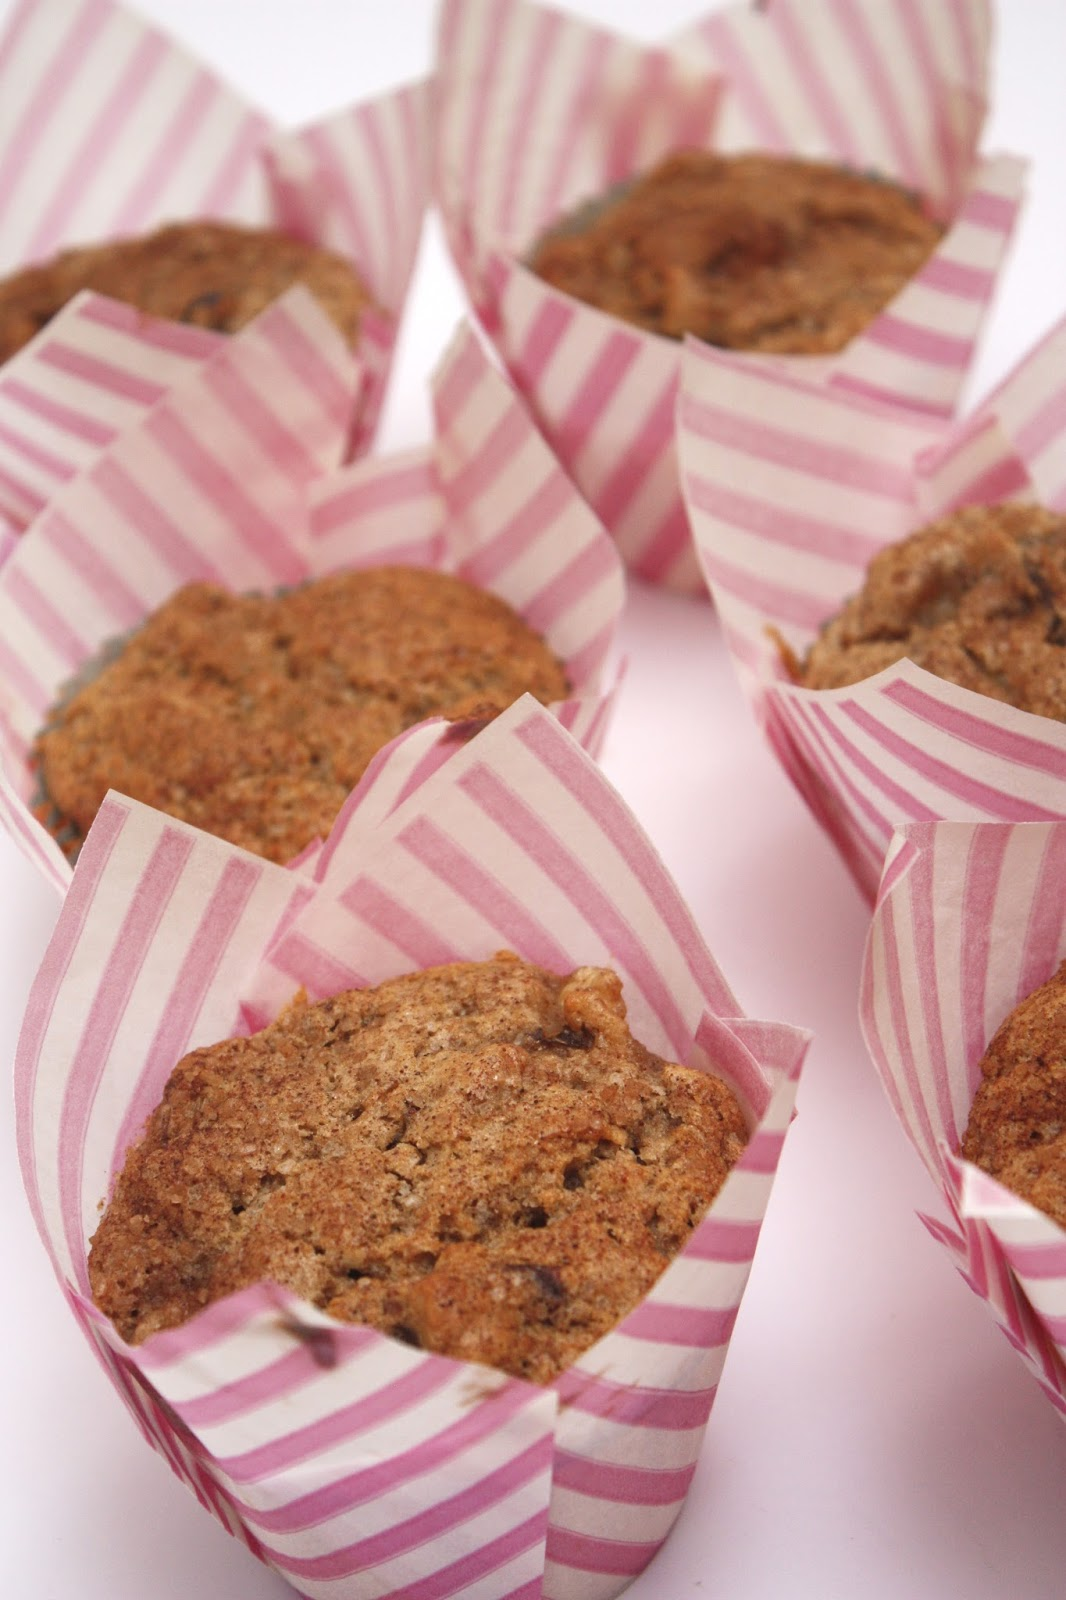 meg-made gluten free banana date and cinnamon muffins